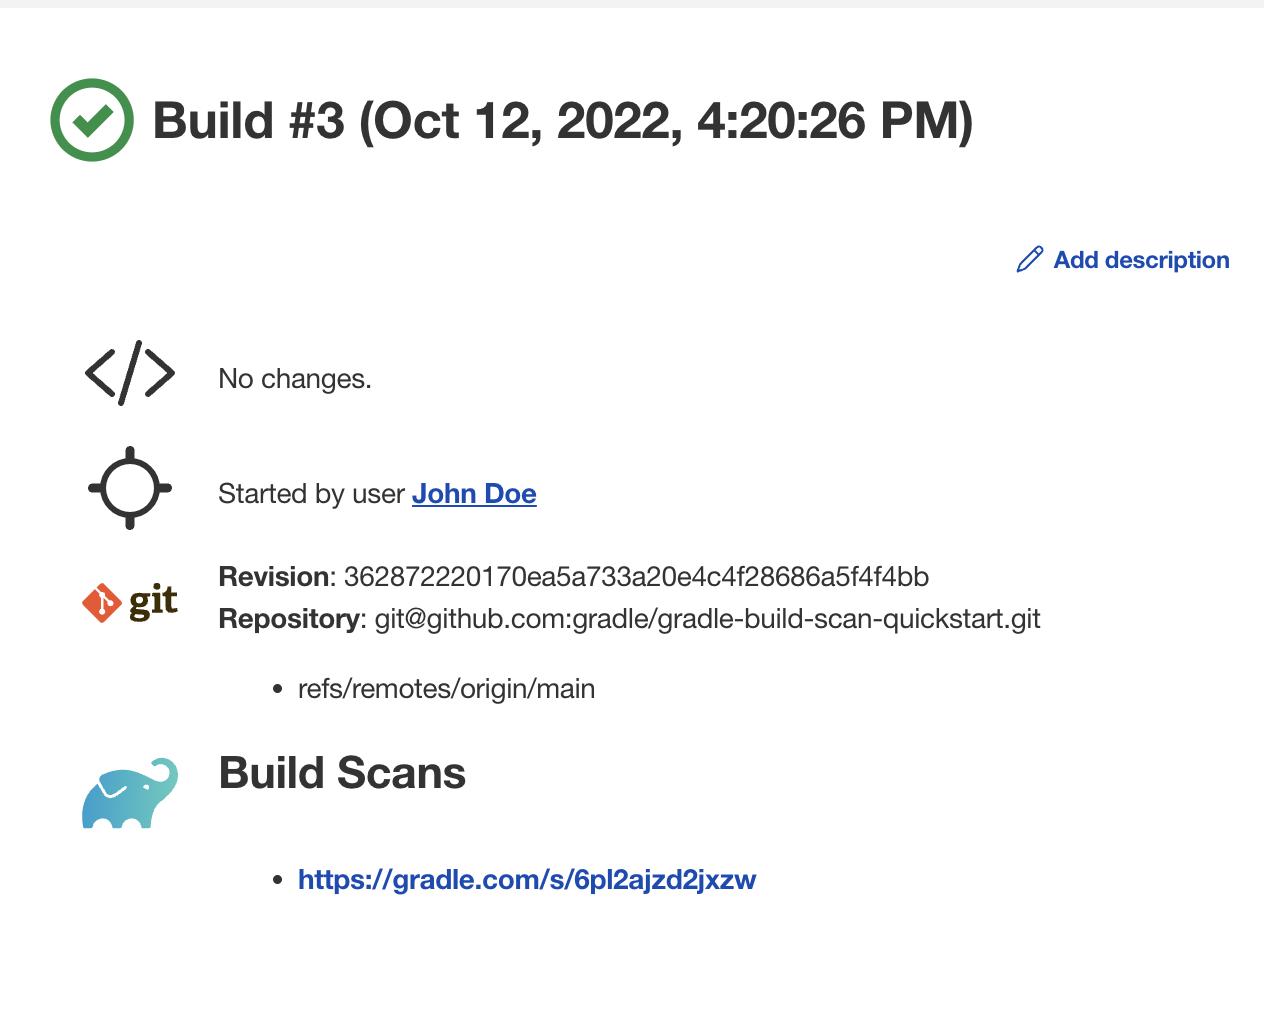 Build Scan link